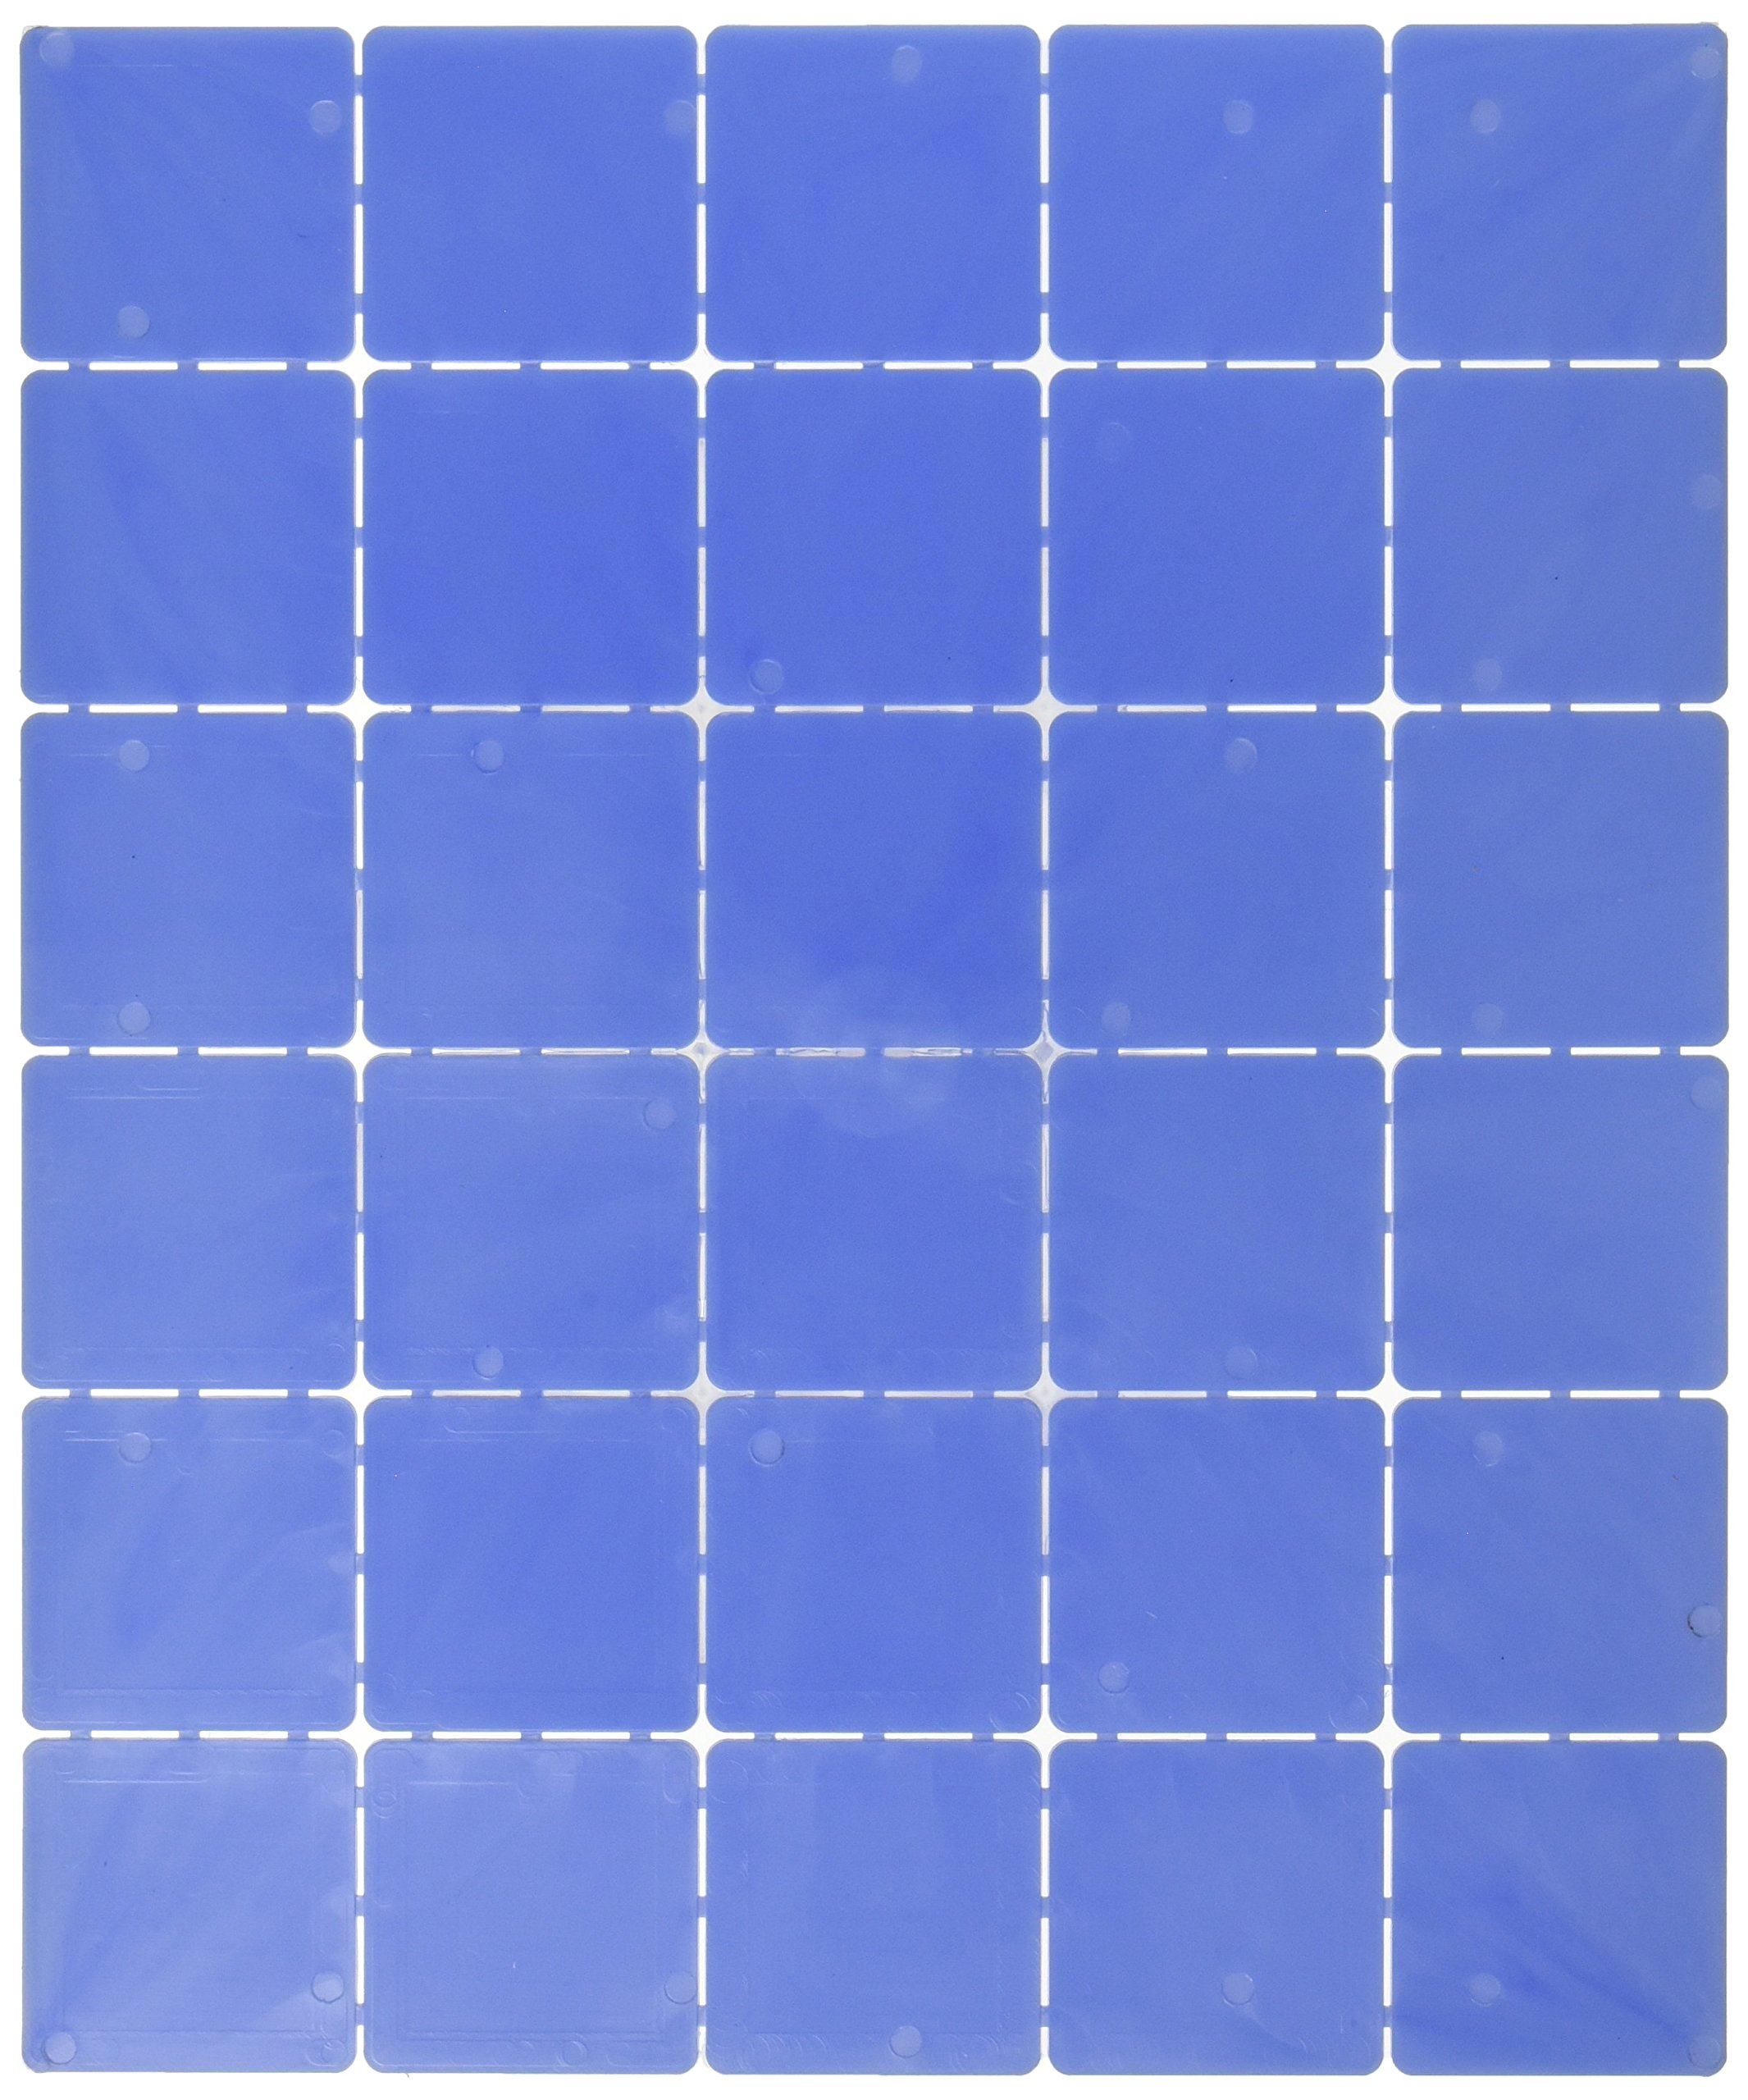 Bon 21-267 Plastic 2'' x 2'' x 1/16'' Masonry Shim by bon